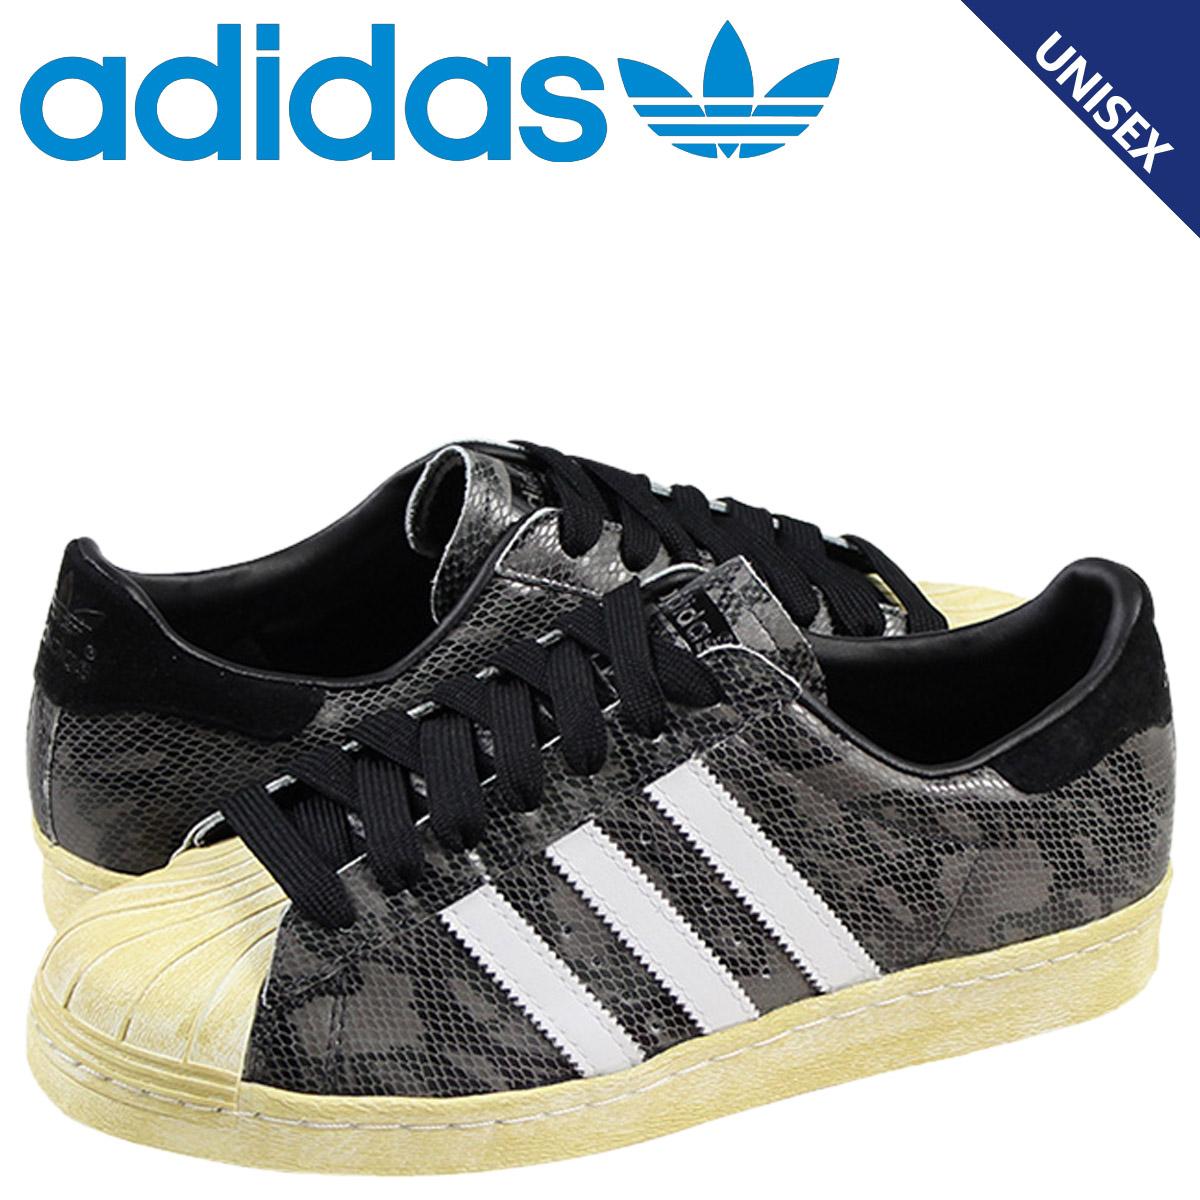 on sale 93b42 827d2 adidas Originals adidas originals sneakers SUPERSTAR 80S G95846 men s  women s shoes black